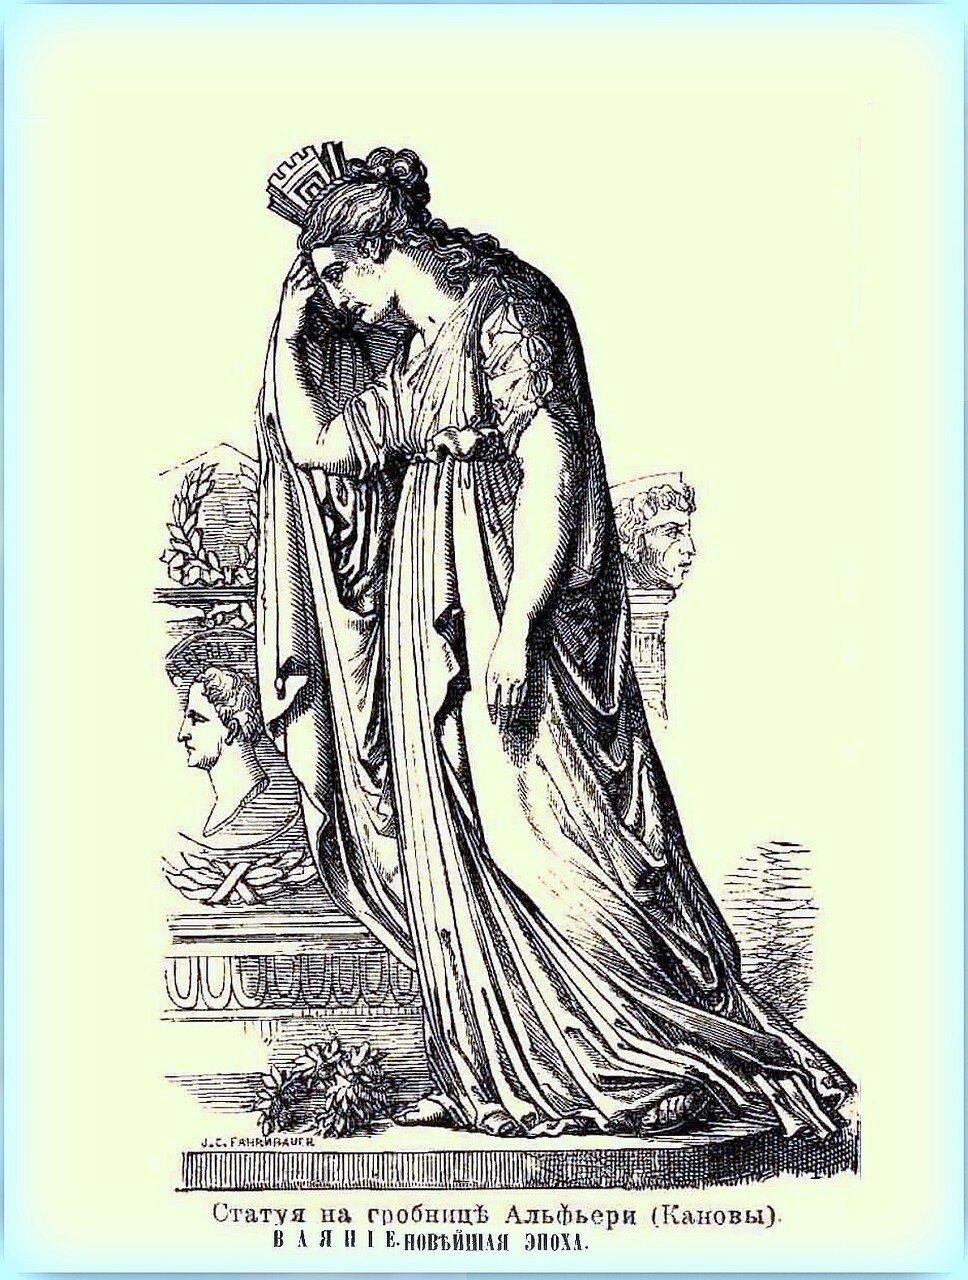 Статуя на гробнице Альфьери ( Кановы) Ваяние. Эпоха новейшая. (16 - 19 века) (4).jpg